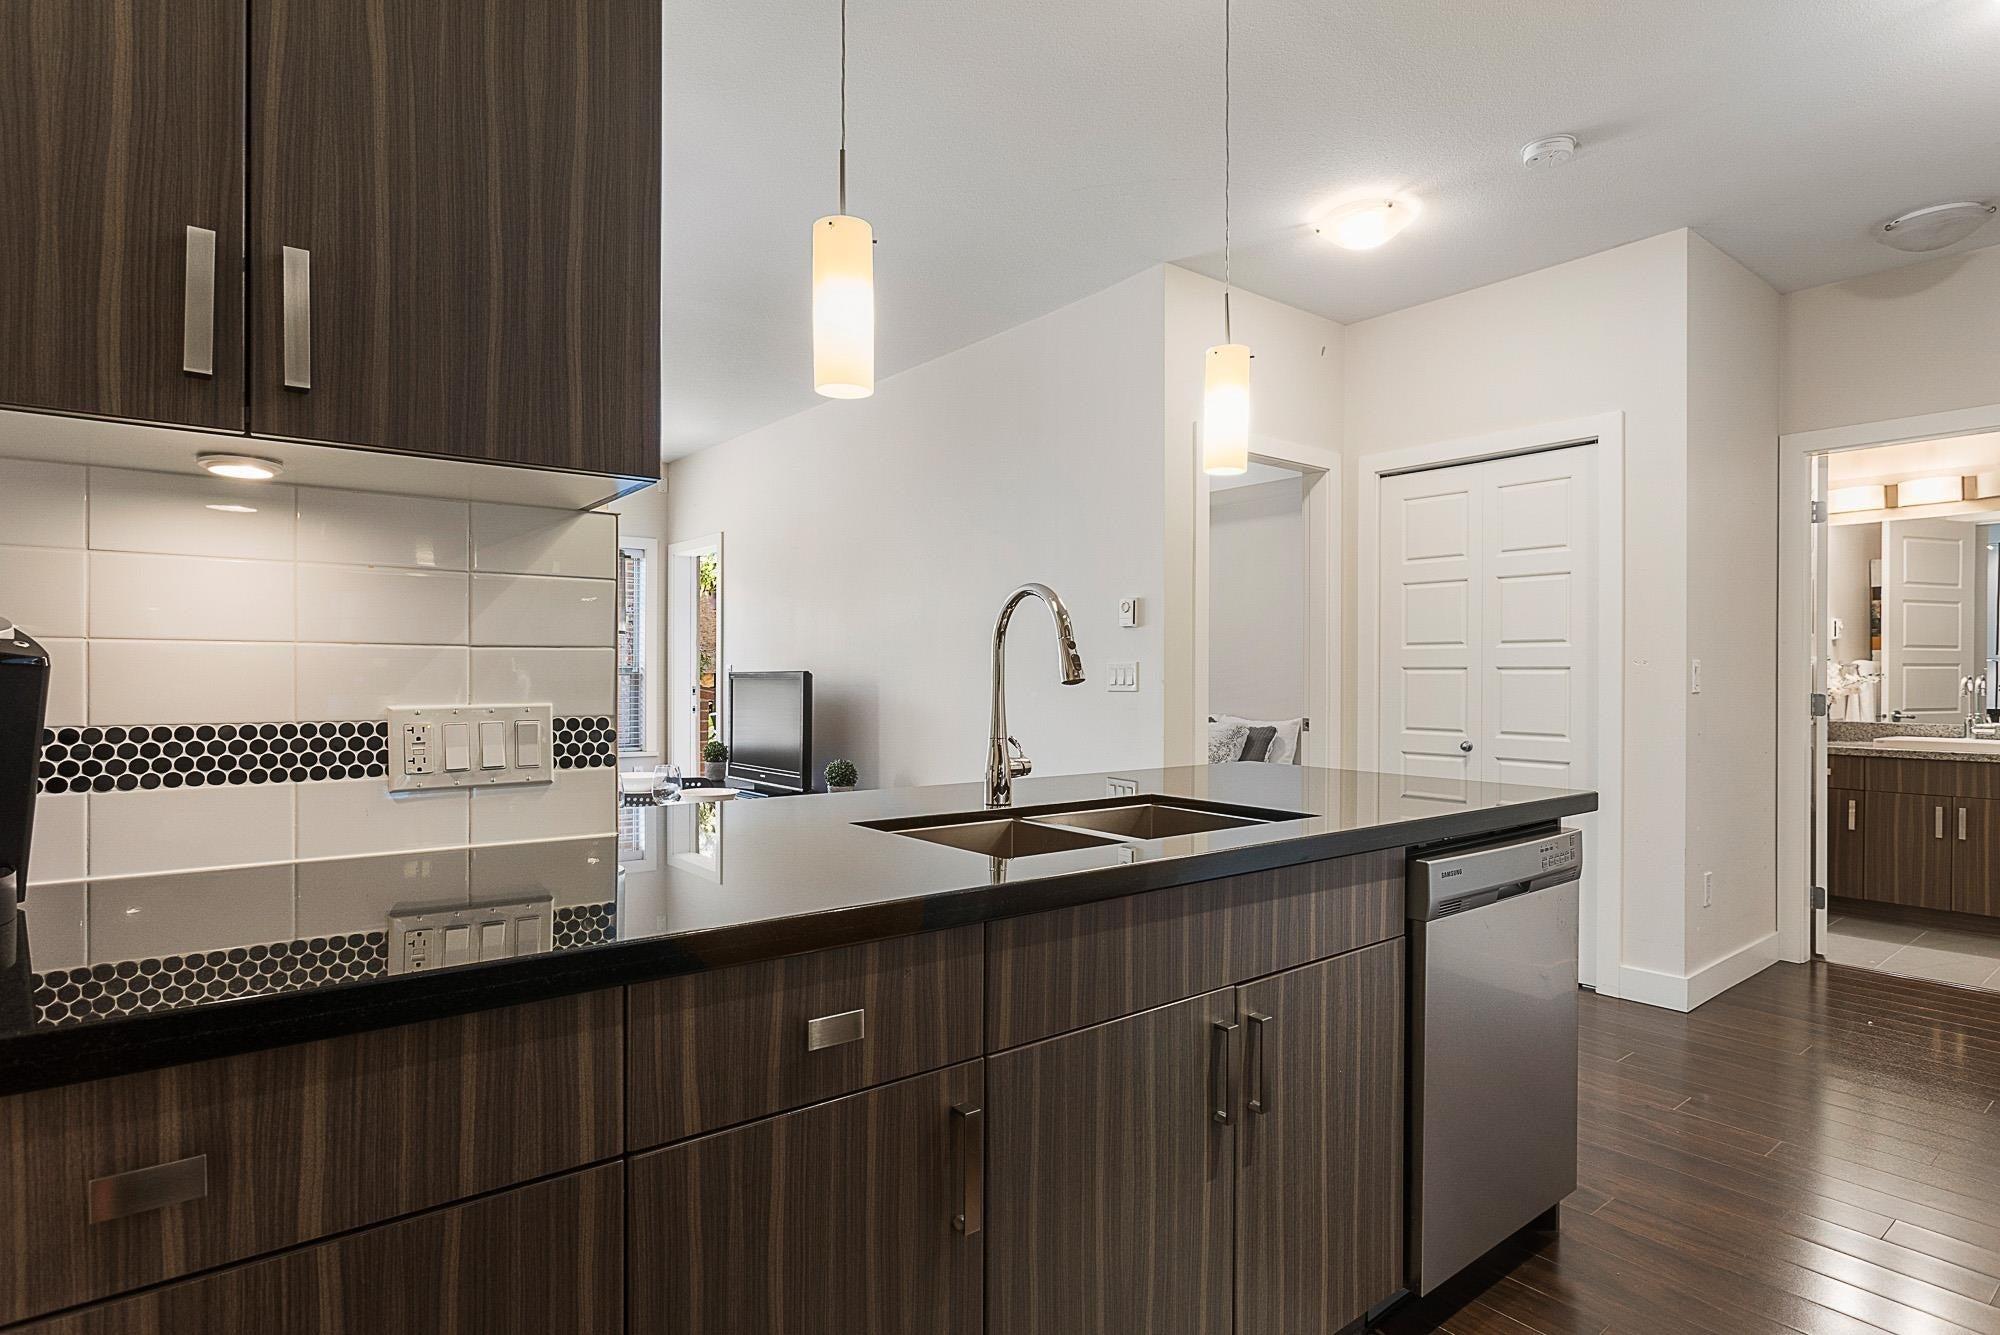 114 20219 54A AVENUE - Langley City Apartment/Condo for sale, 1 Bedroom (R2616172) - #7